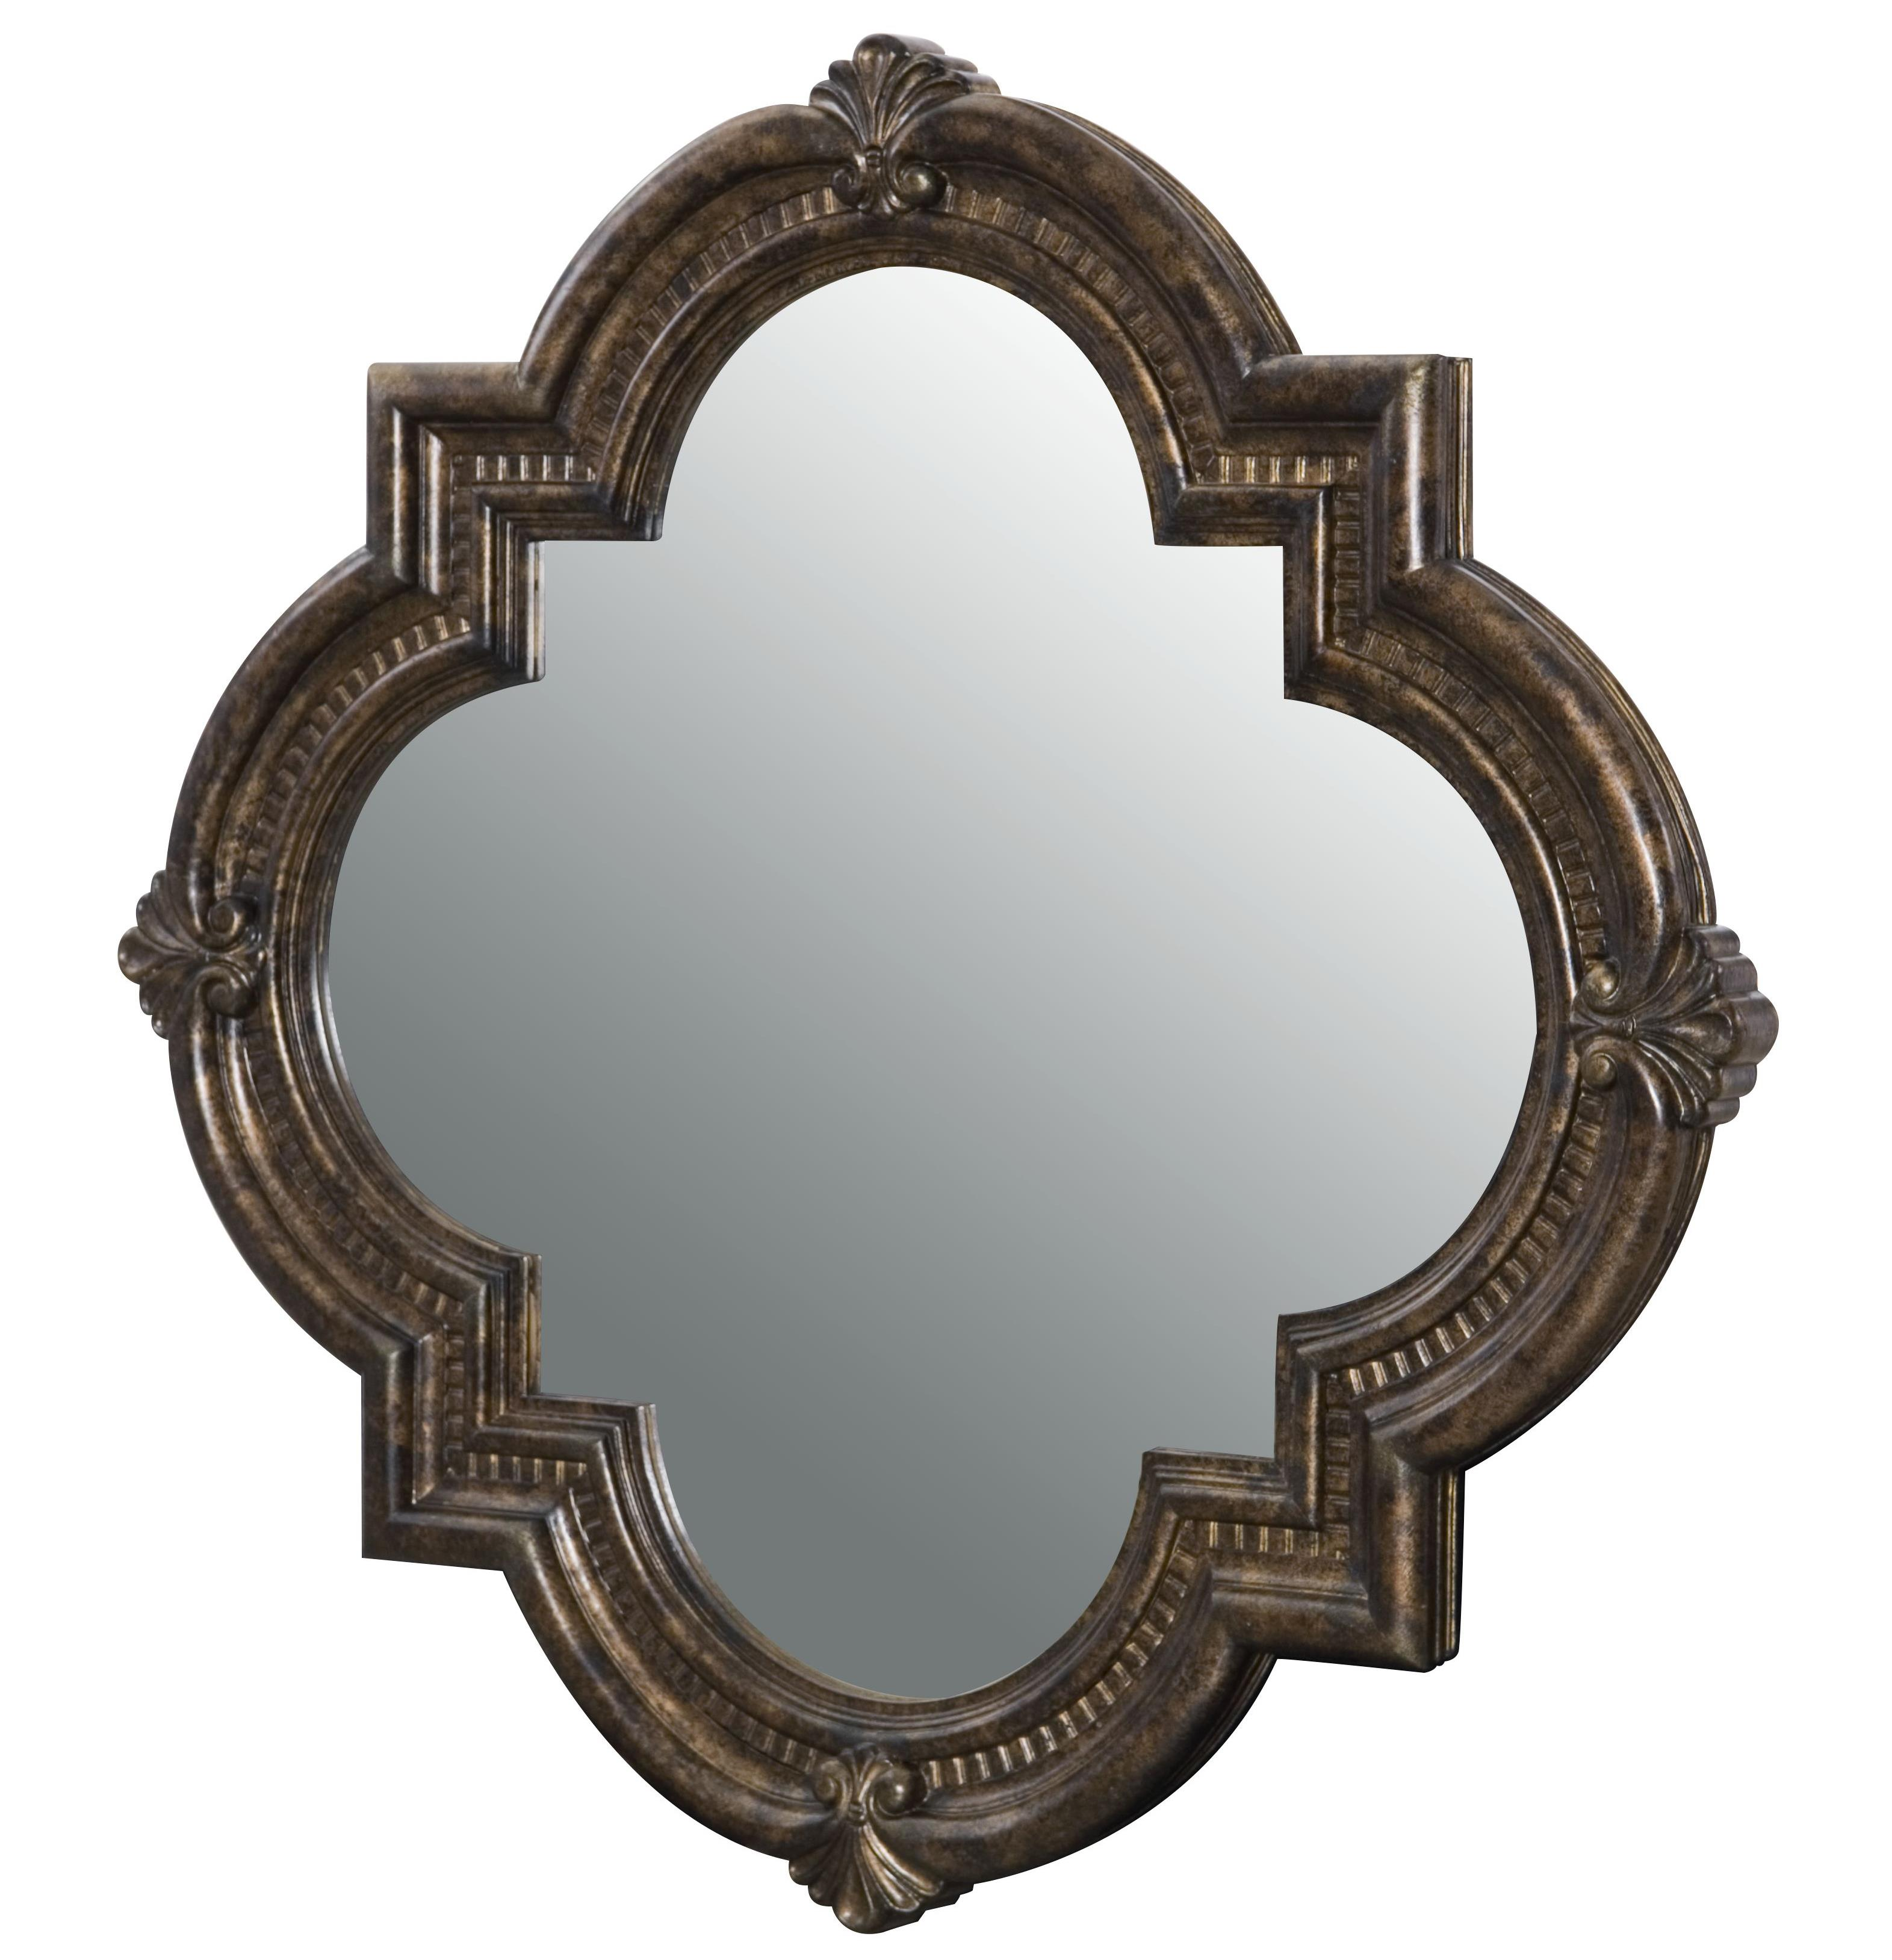 Legacy Classic La Bella Vita Decorative Accent Mirror - Item Number: 4200-0800